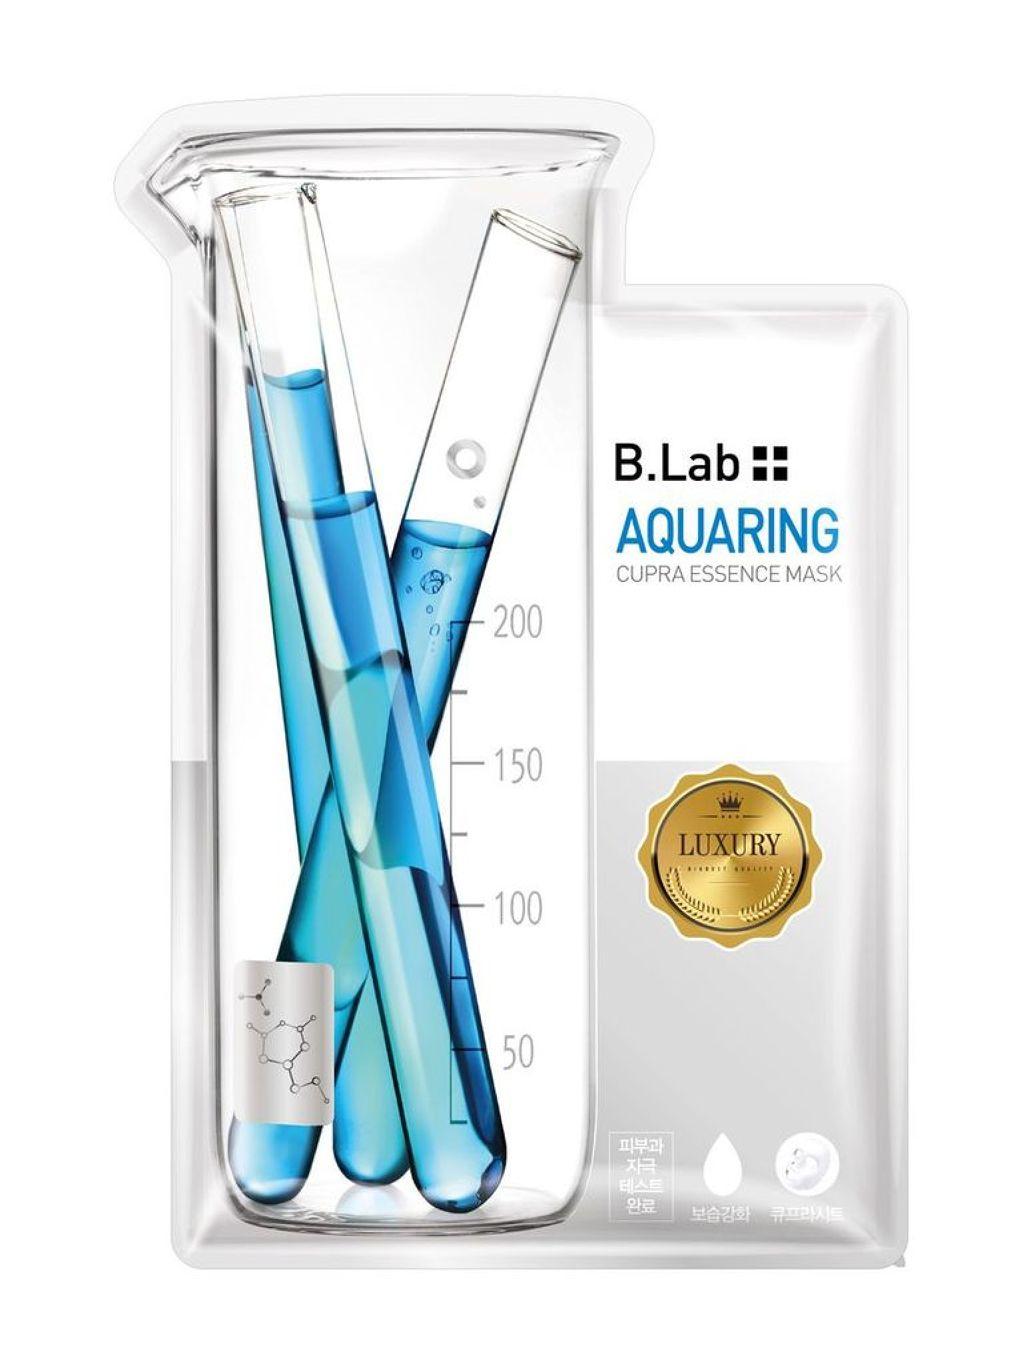 B.Lab Aquaring Cupra Essence Mask - c46bb-b-lab-aquaring-1.jpg